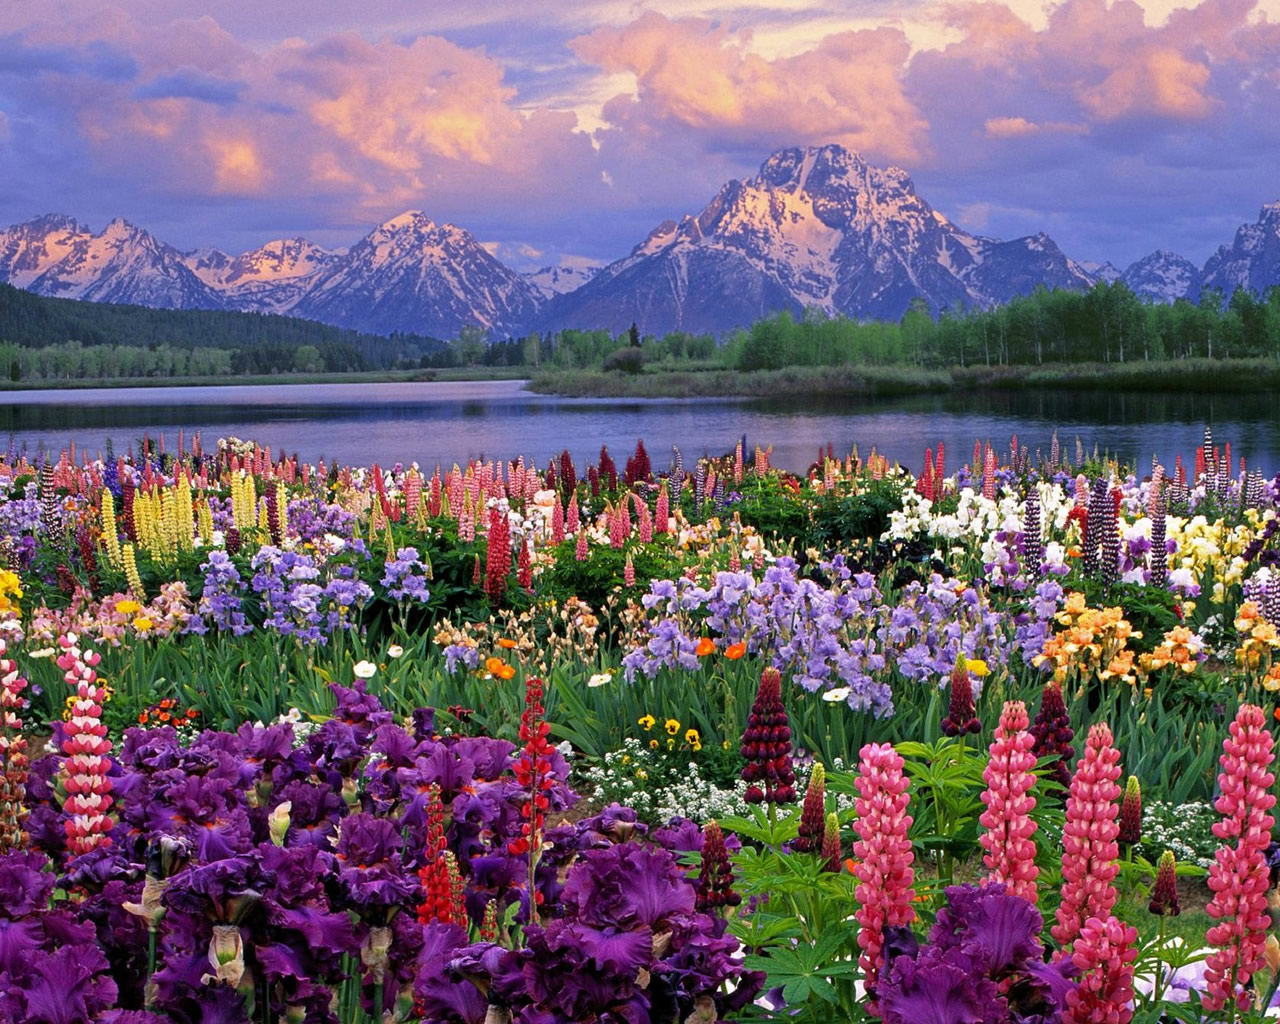 Spring Mountain Landscape Hd Desktop Wallpaper 1280x1024